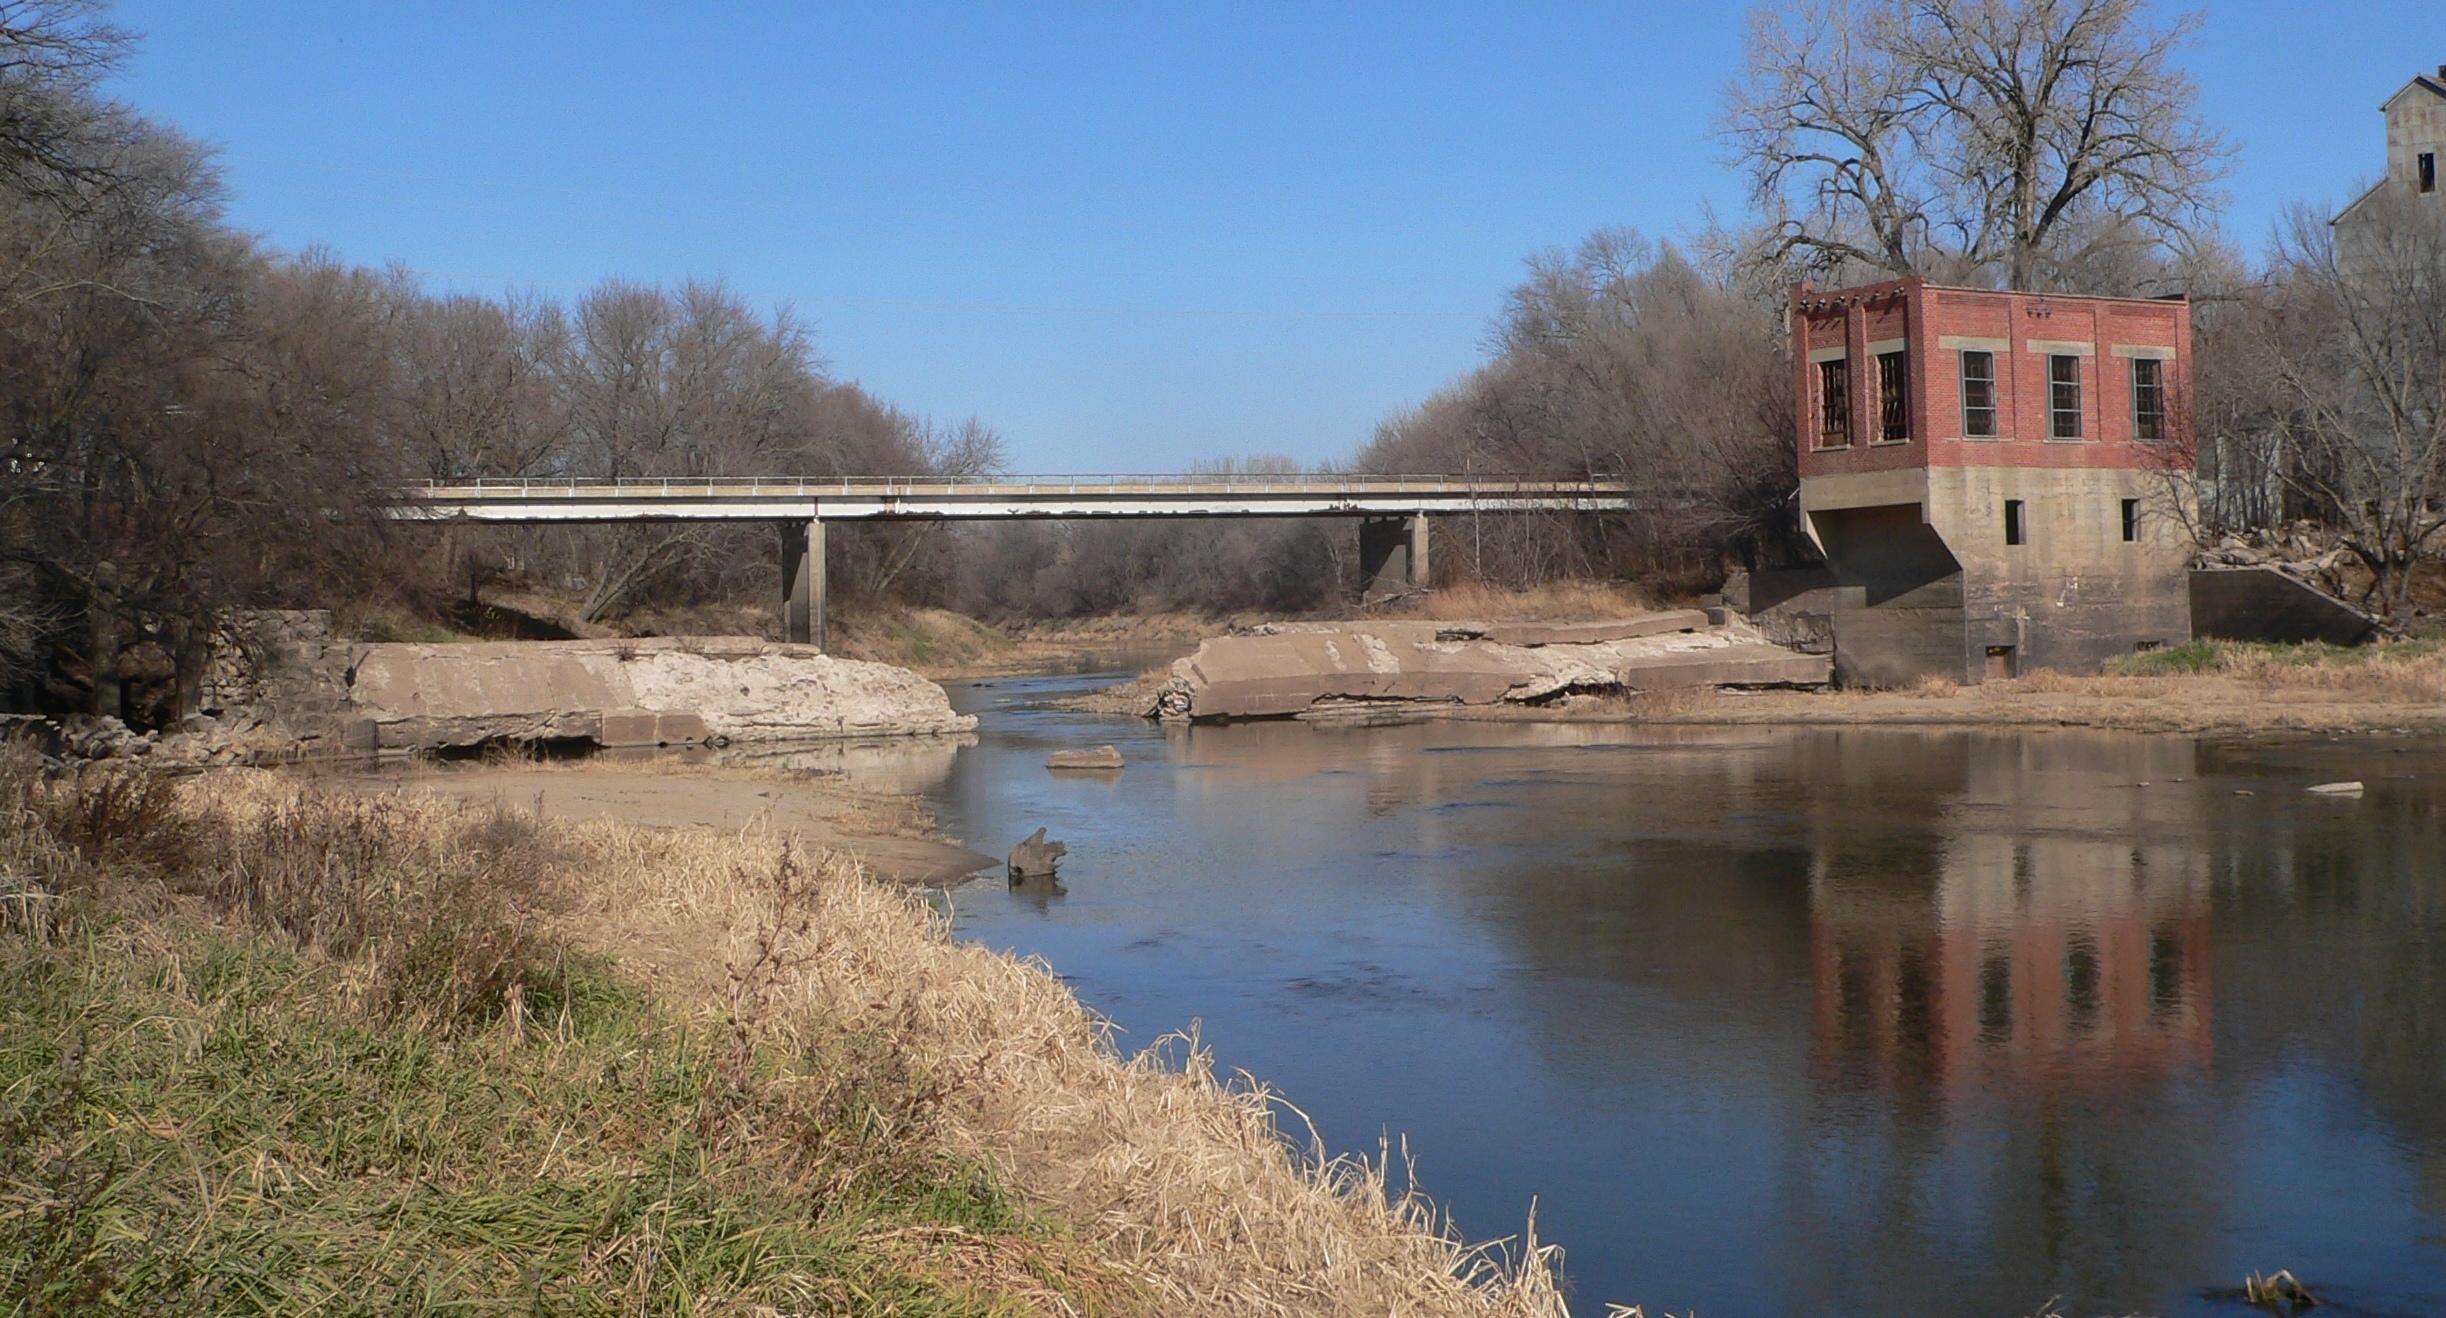 File:Blue Springs, Nebraska dam and bridge.JPG - Wikimedia ...